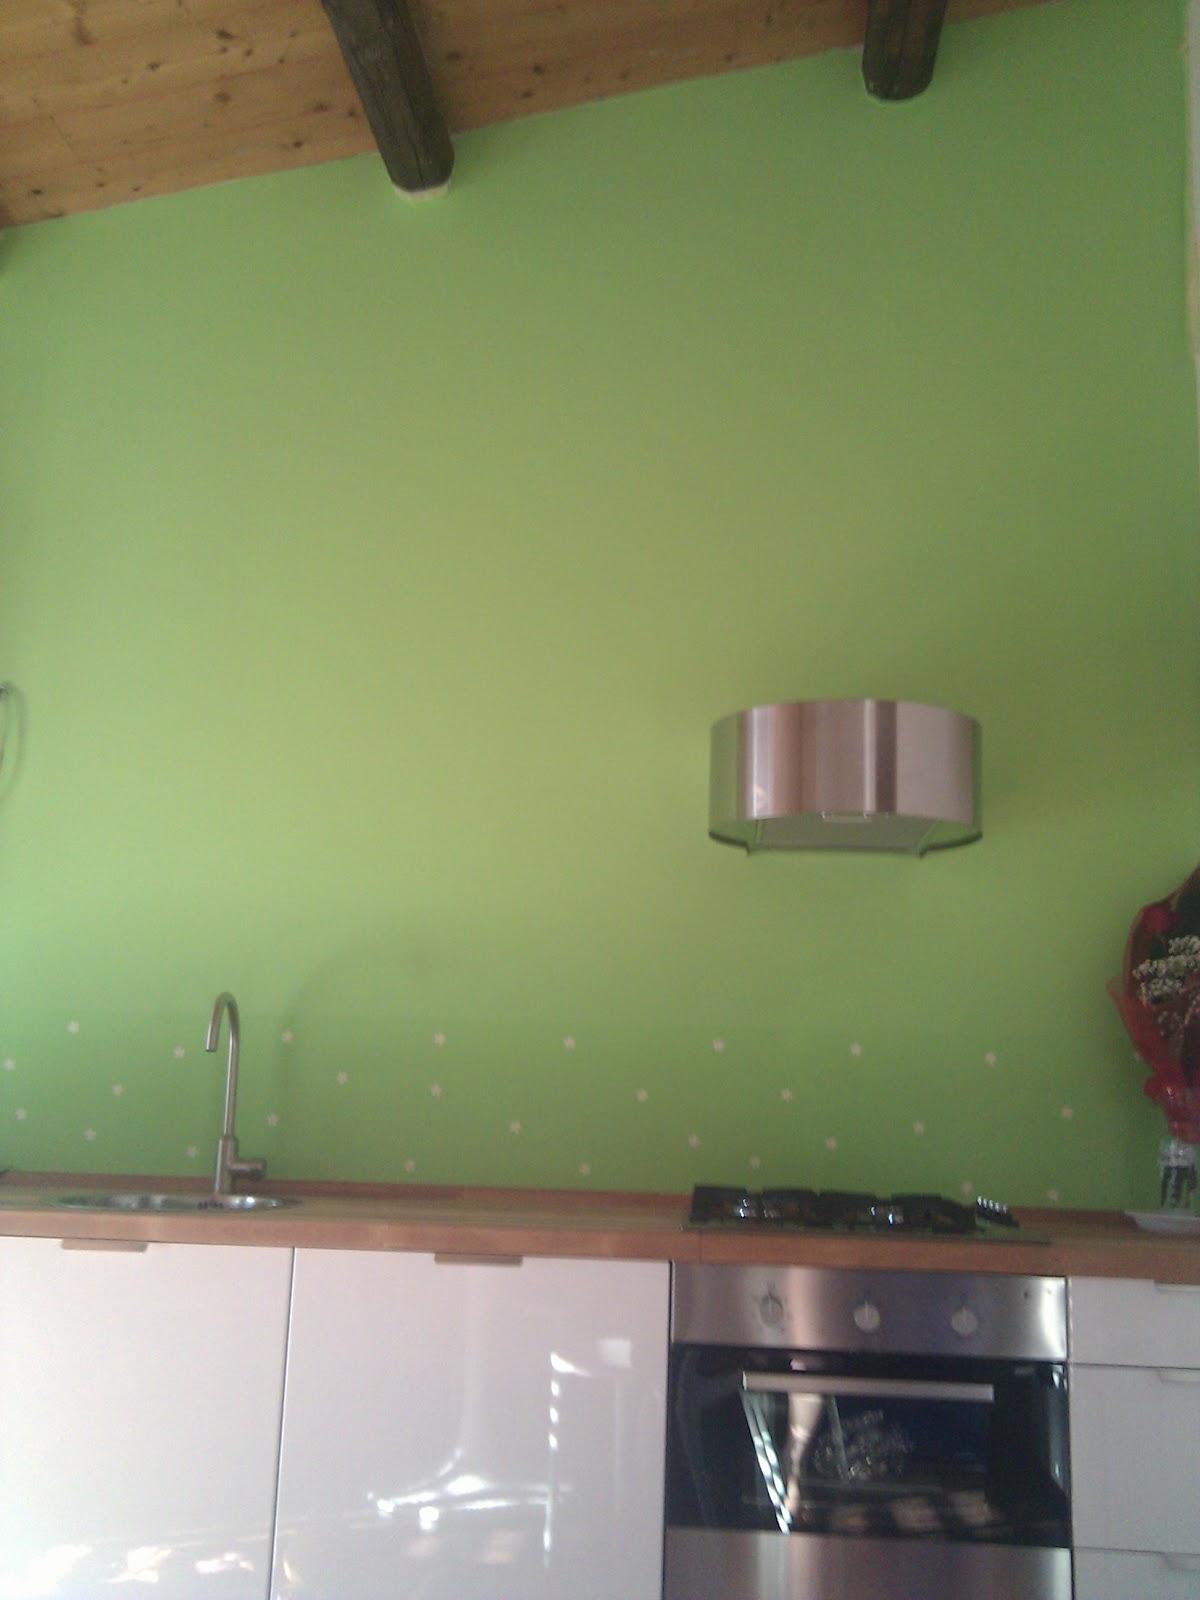 Cucina Verde Mela | Arabafelice In Cucina Omelette Alla Mela Verde